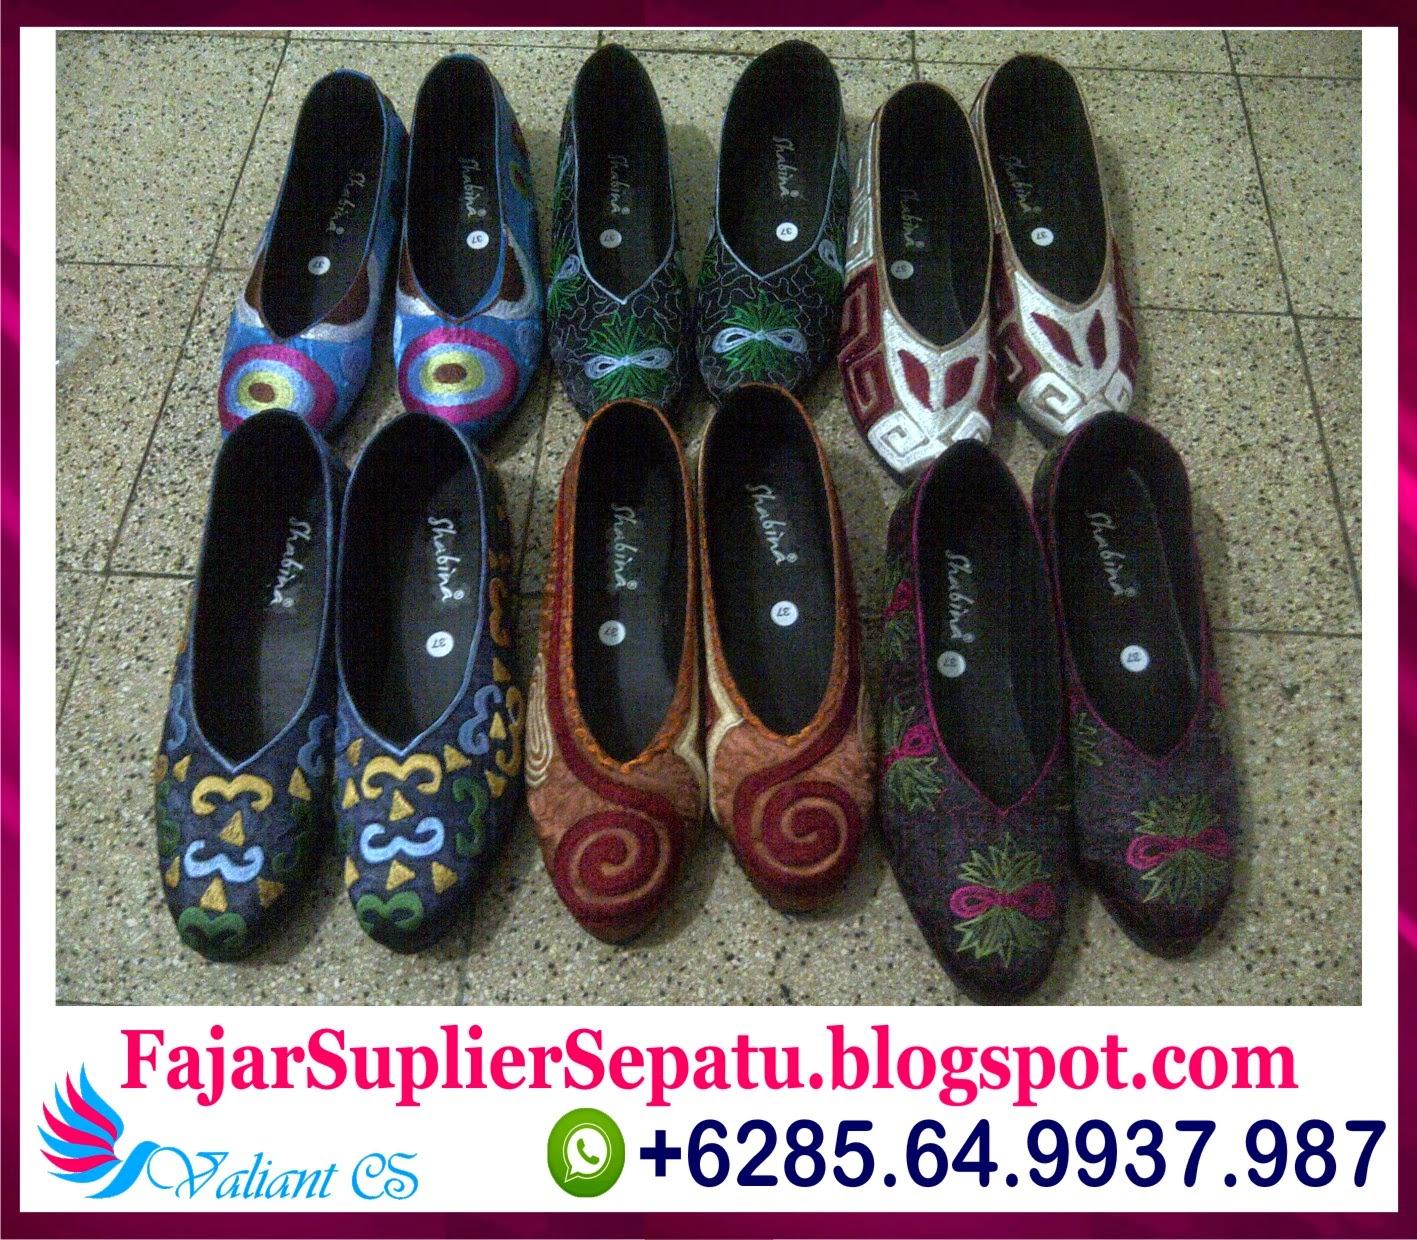 Sepatu Bordir Murah, Grosir Sepatu Bordir Murah, Grosir Sepatu Bordir Bali, +62.8564.993.7987